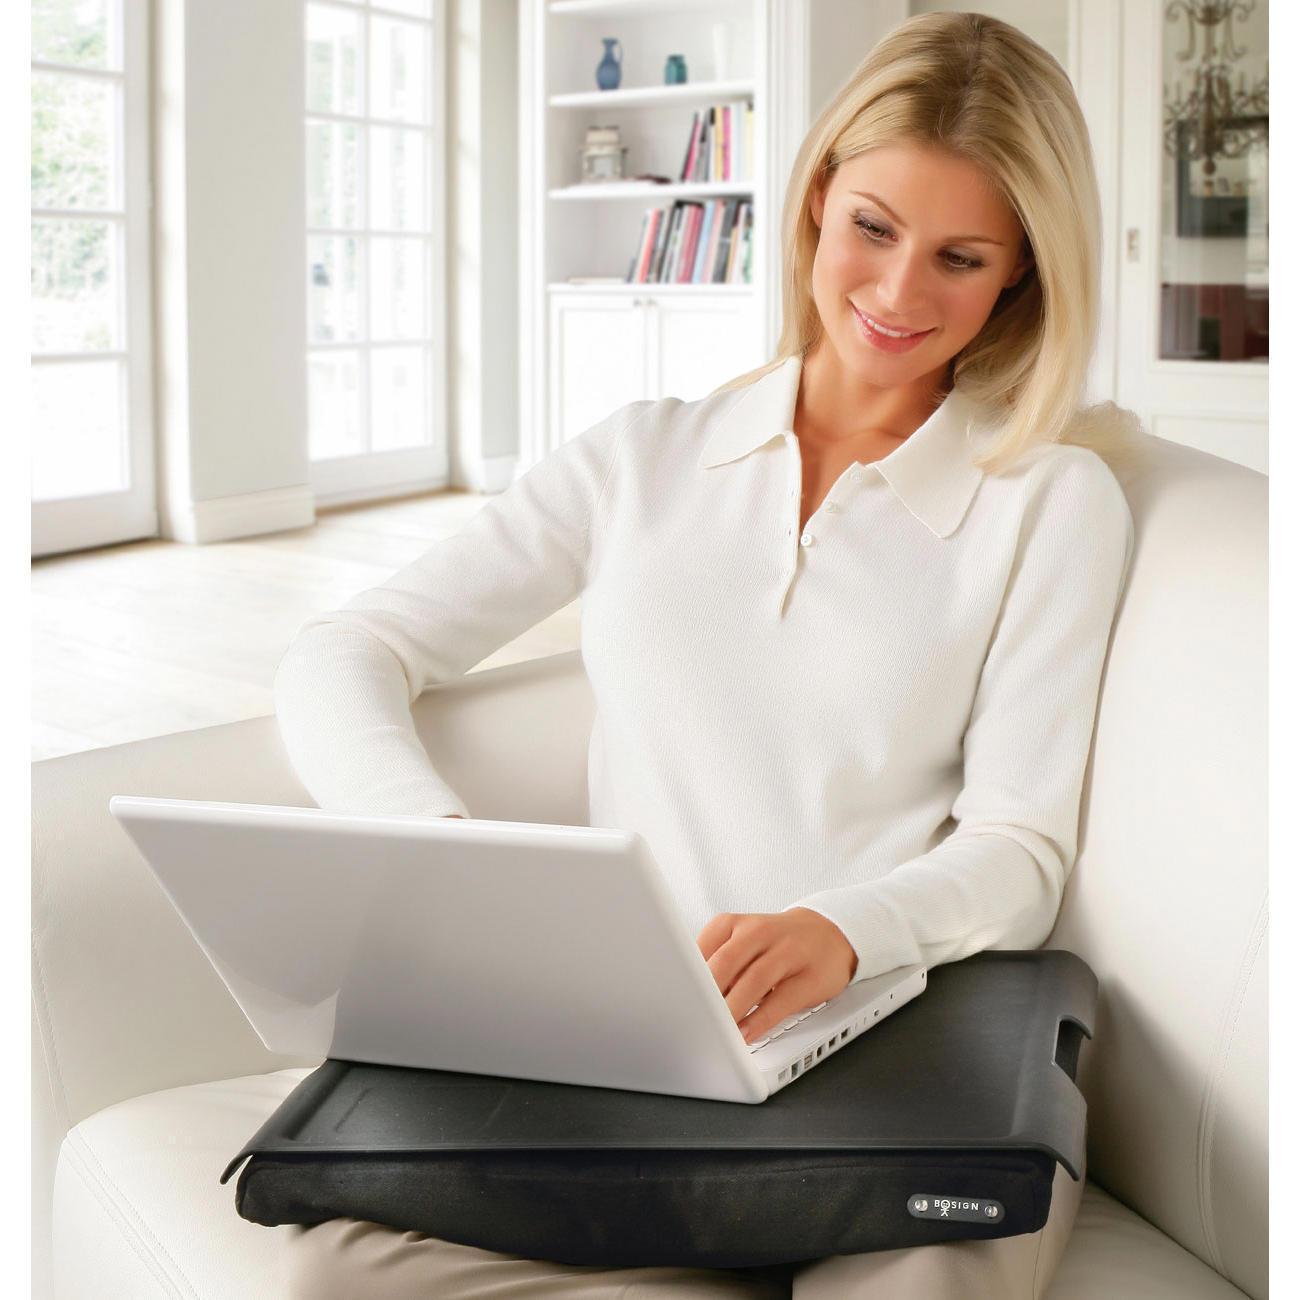 knietablett 3 jahre garantie pro idee. Black Bedroom Furniture Sets. Home Design Ideas